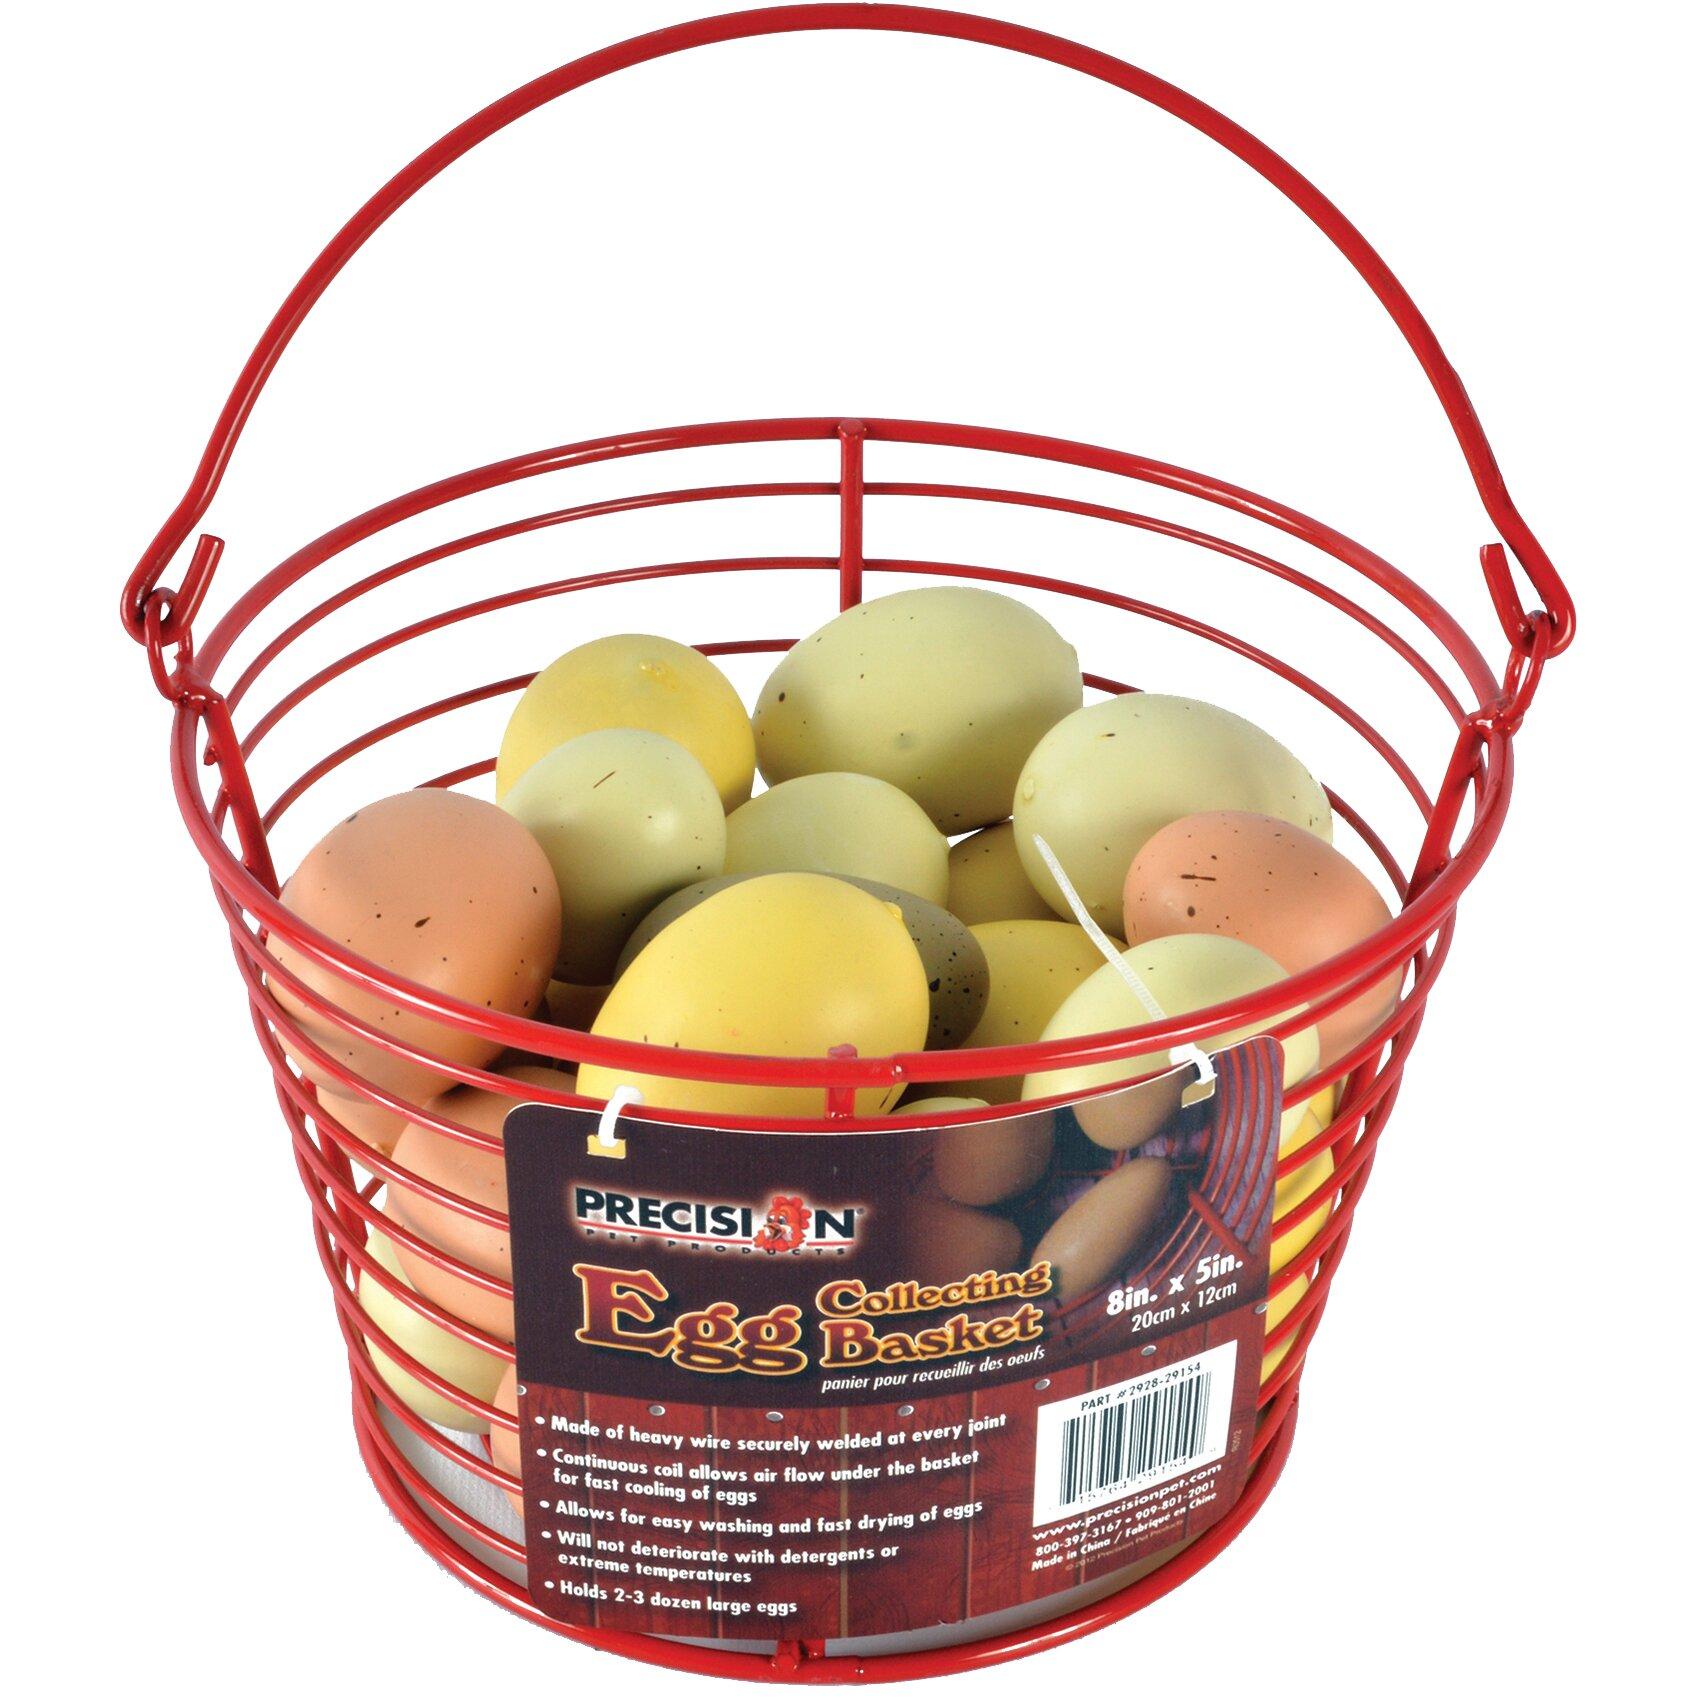 Precision Pet Egg Collecting Basket & Reviews | Wayfair